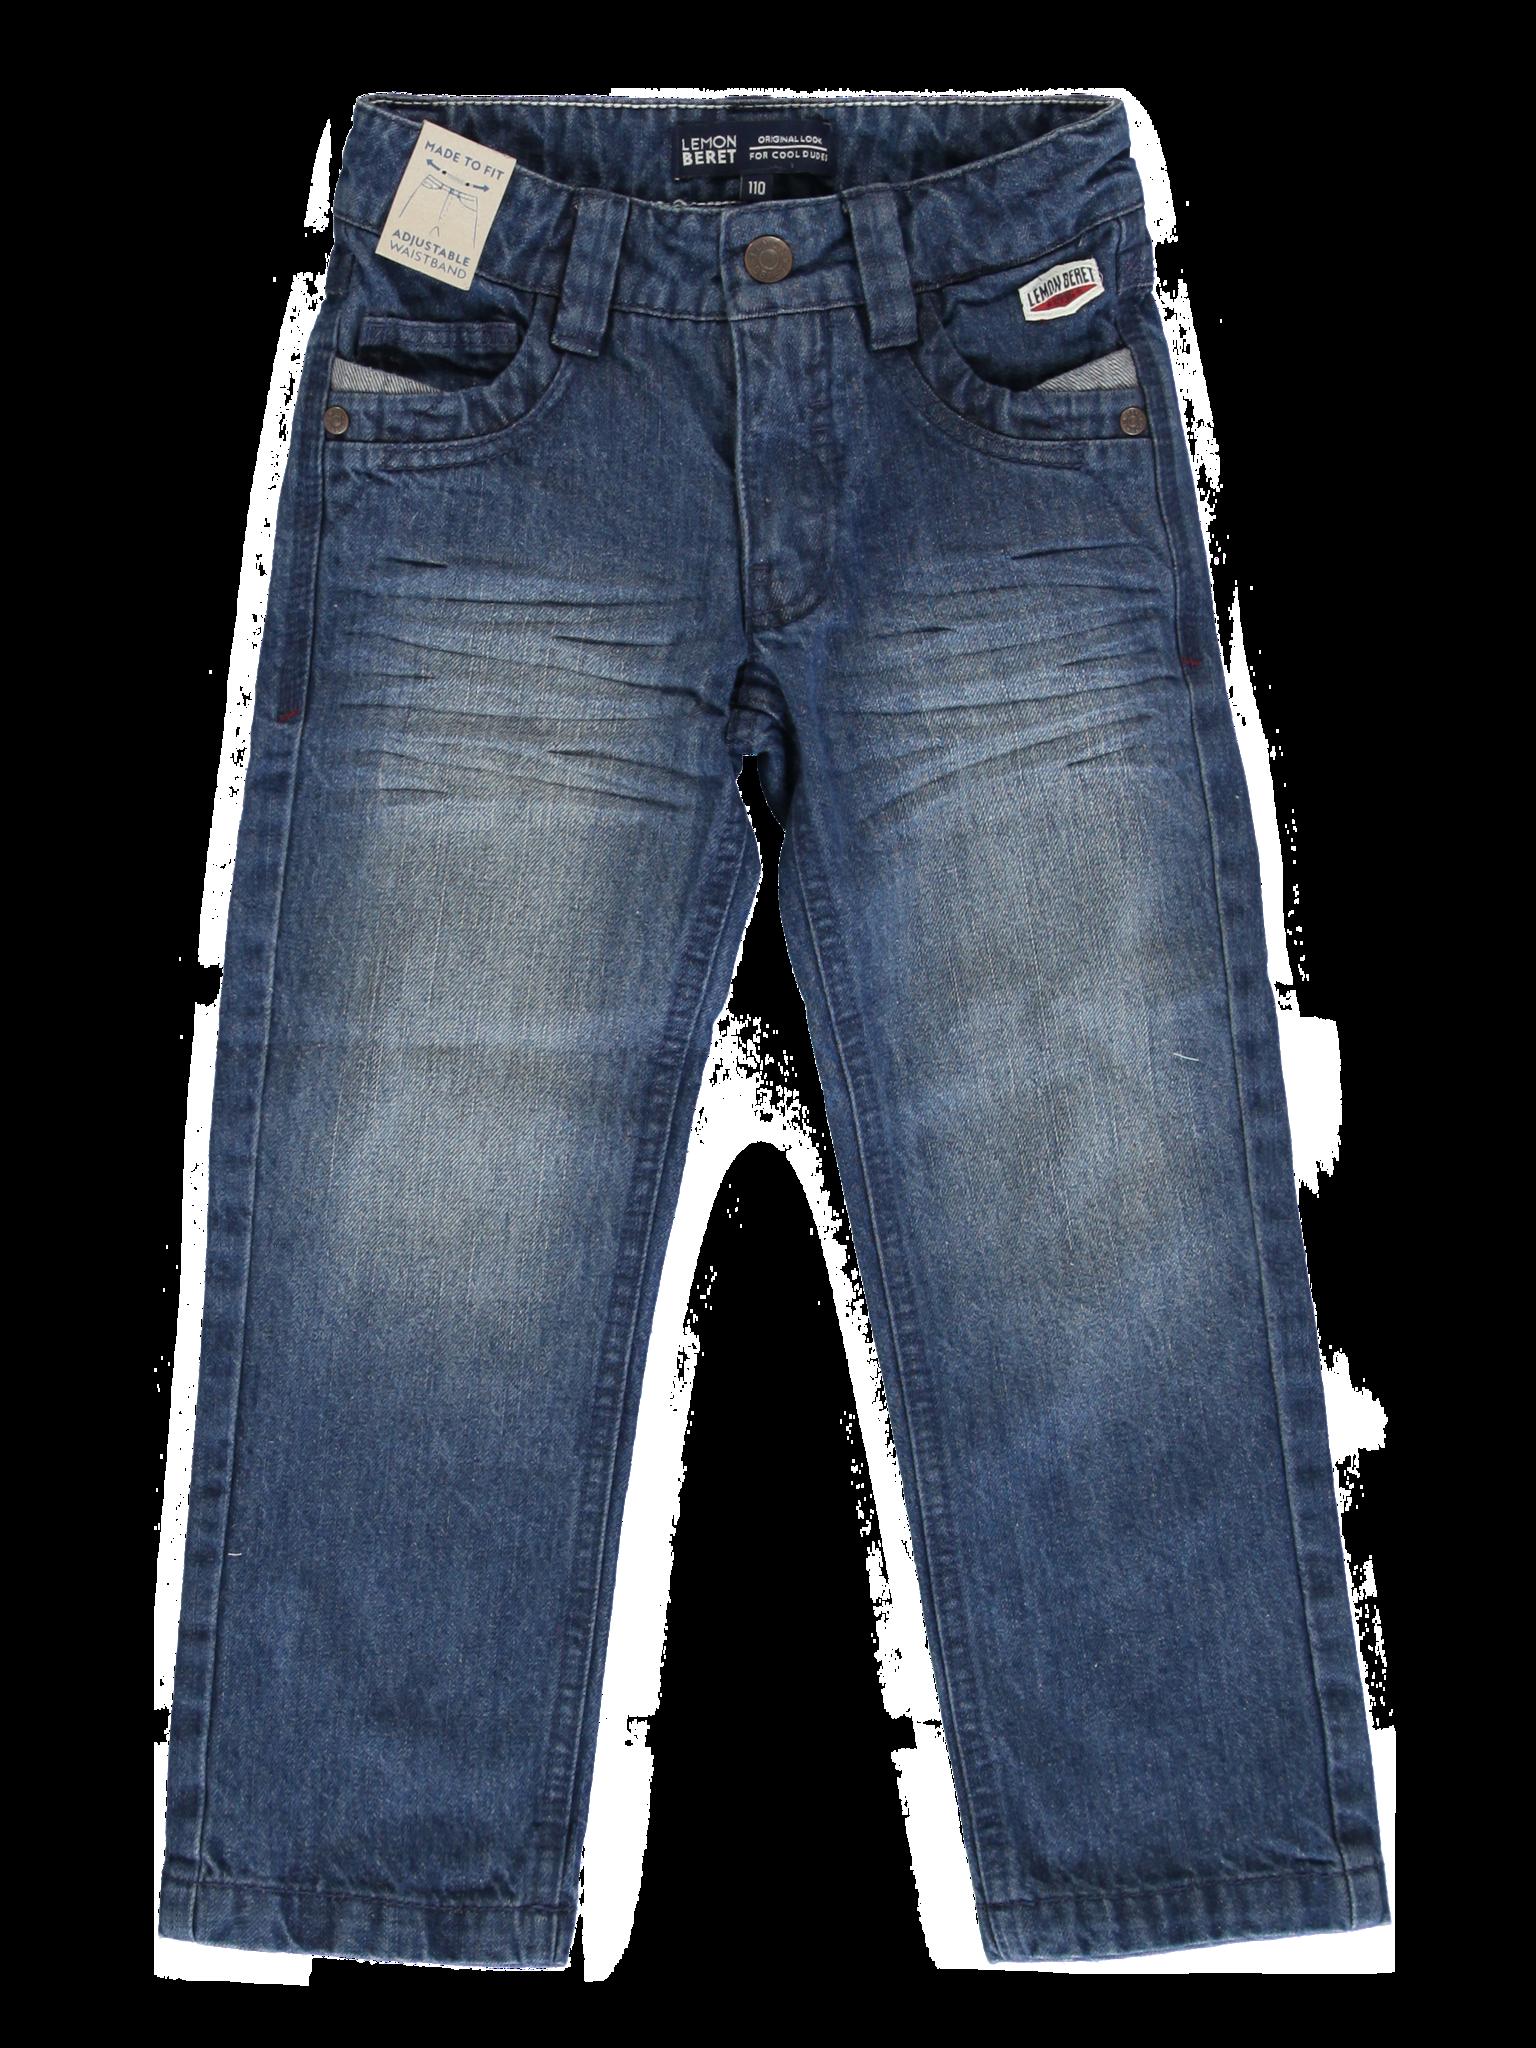 All Brands | Summerproducts Small Boys | Pant Denim | 10 pcs/box